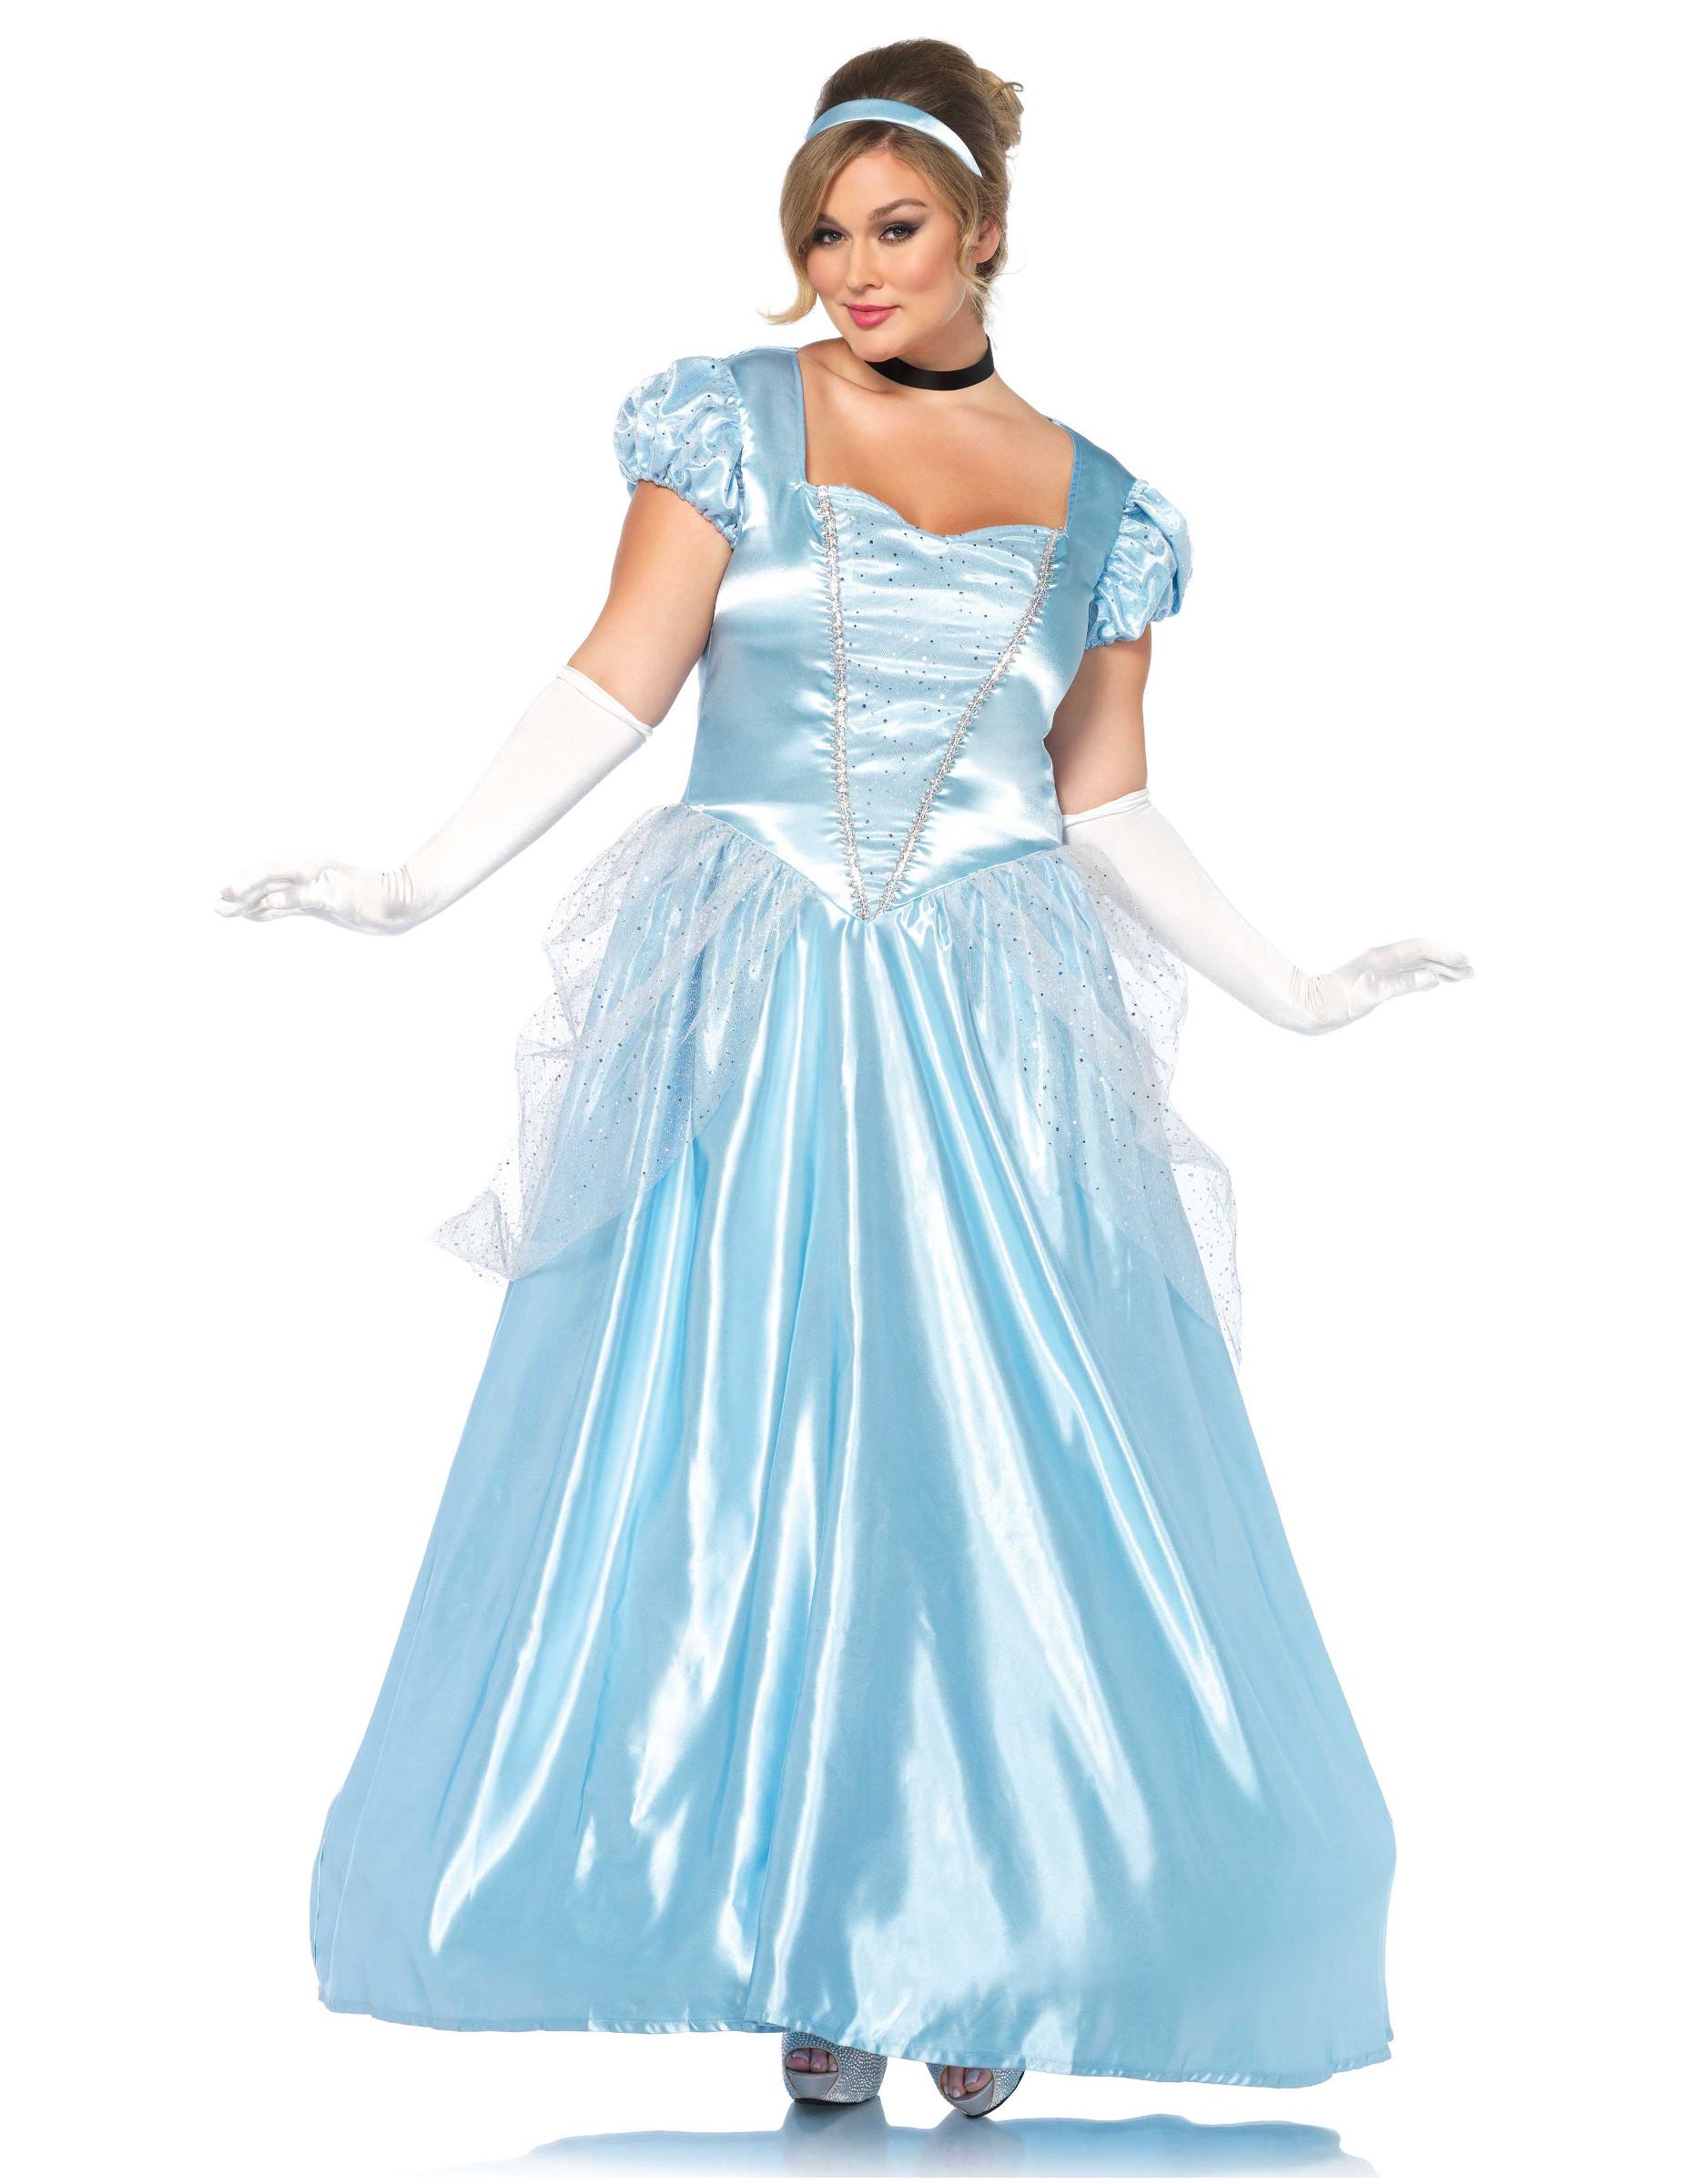 55d5a6743ebf Costume principessa azzurra donna  Costumi adulti